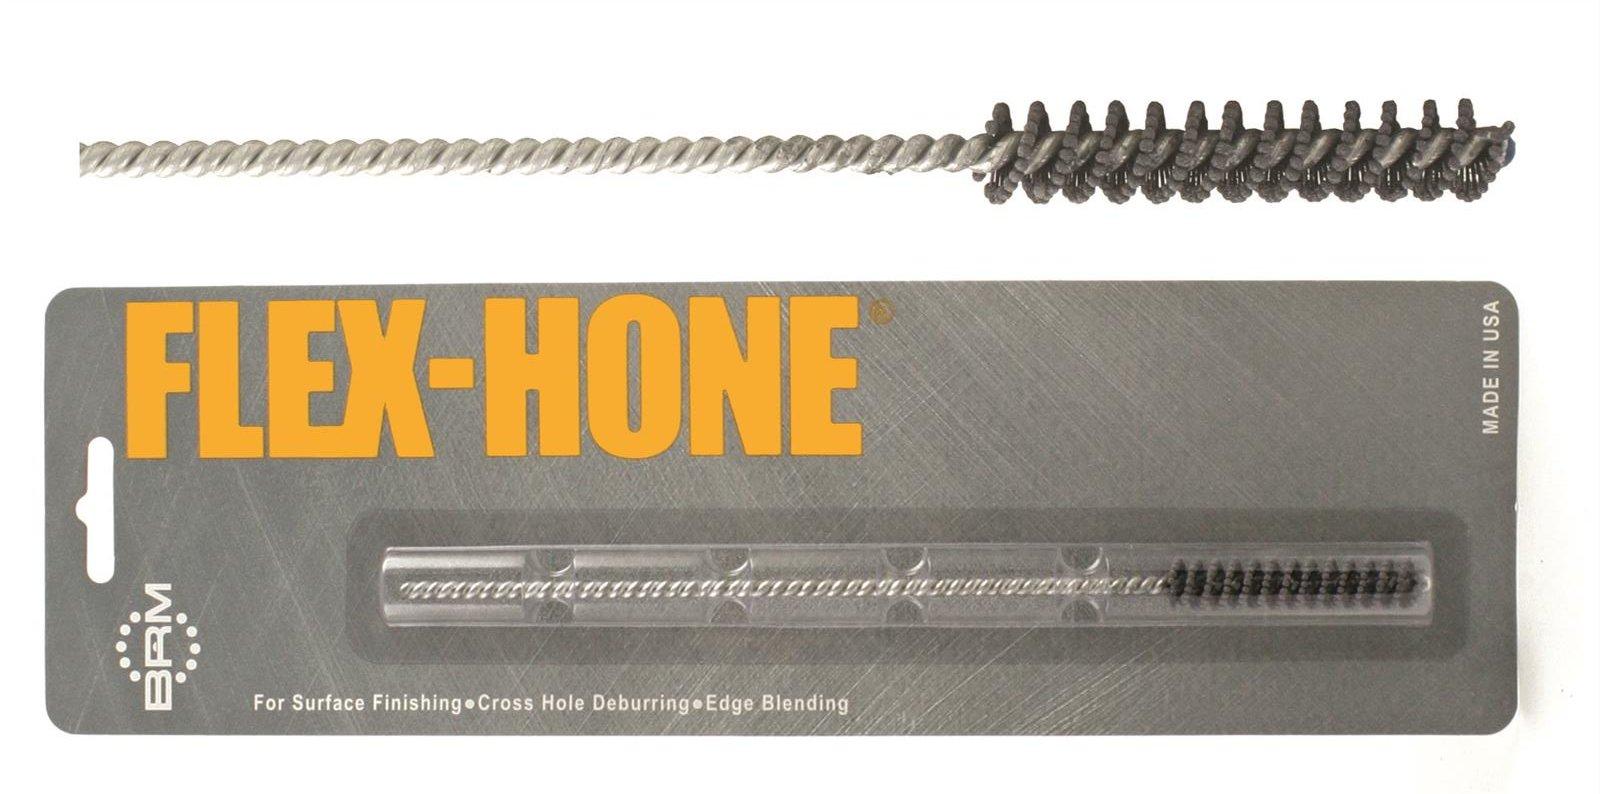 Fflex hone tool.jpg